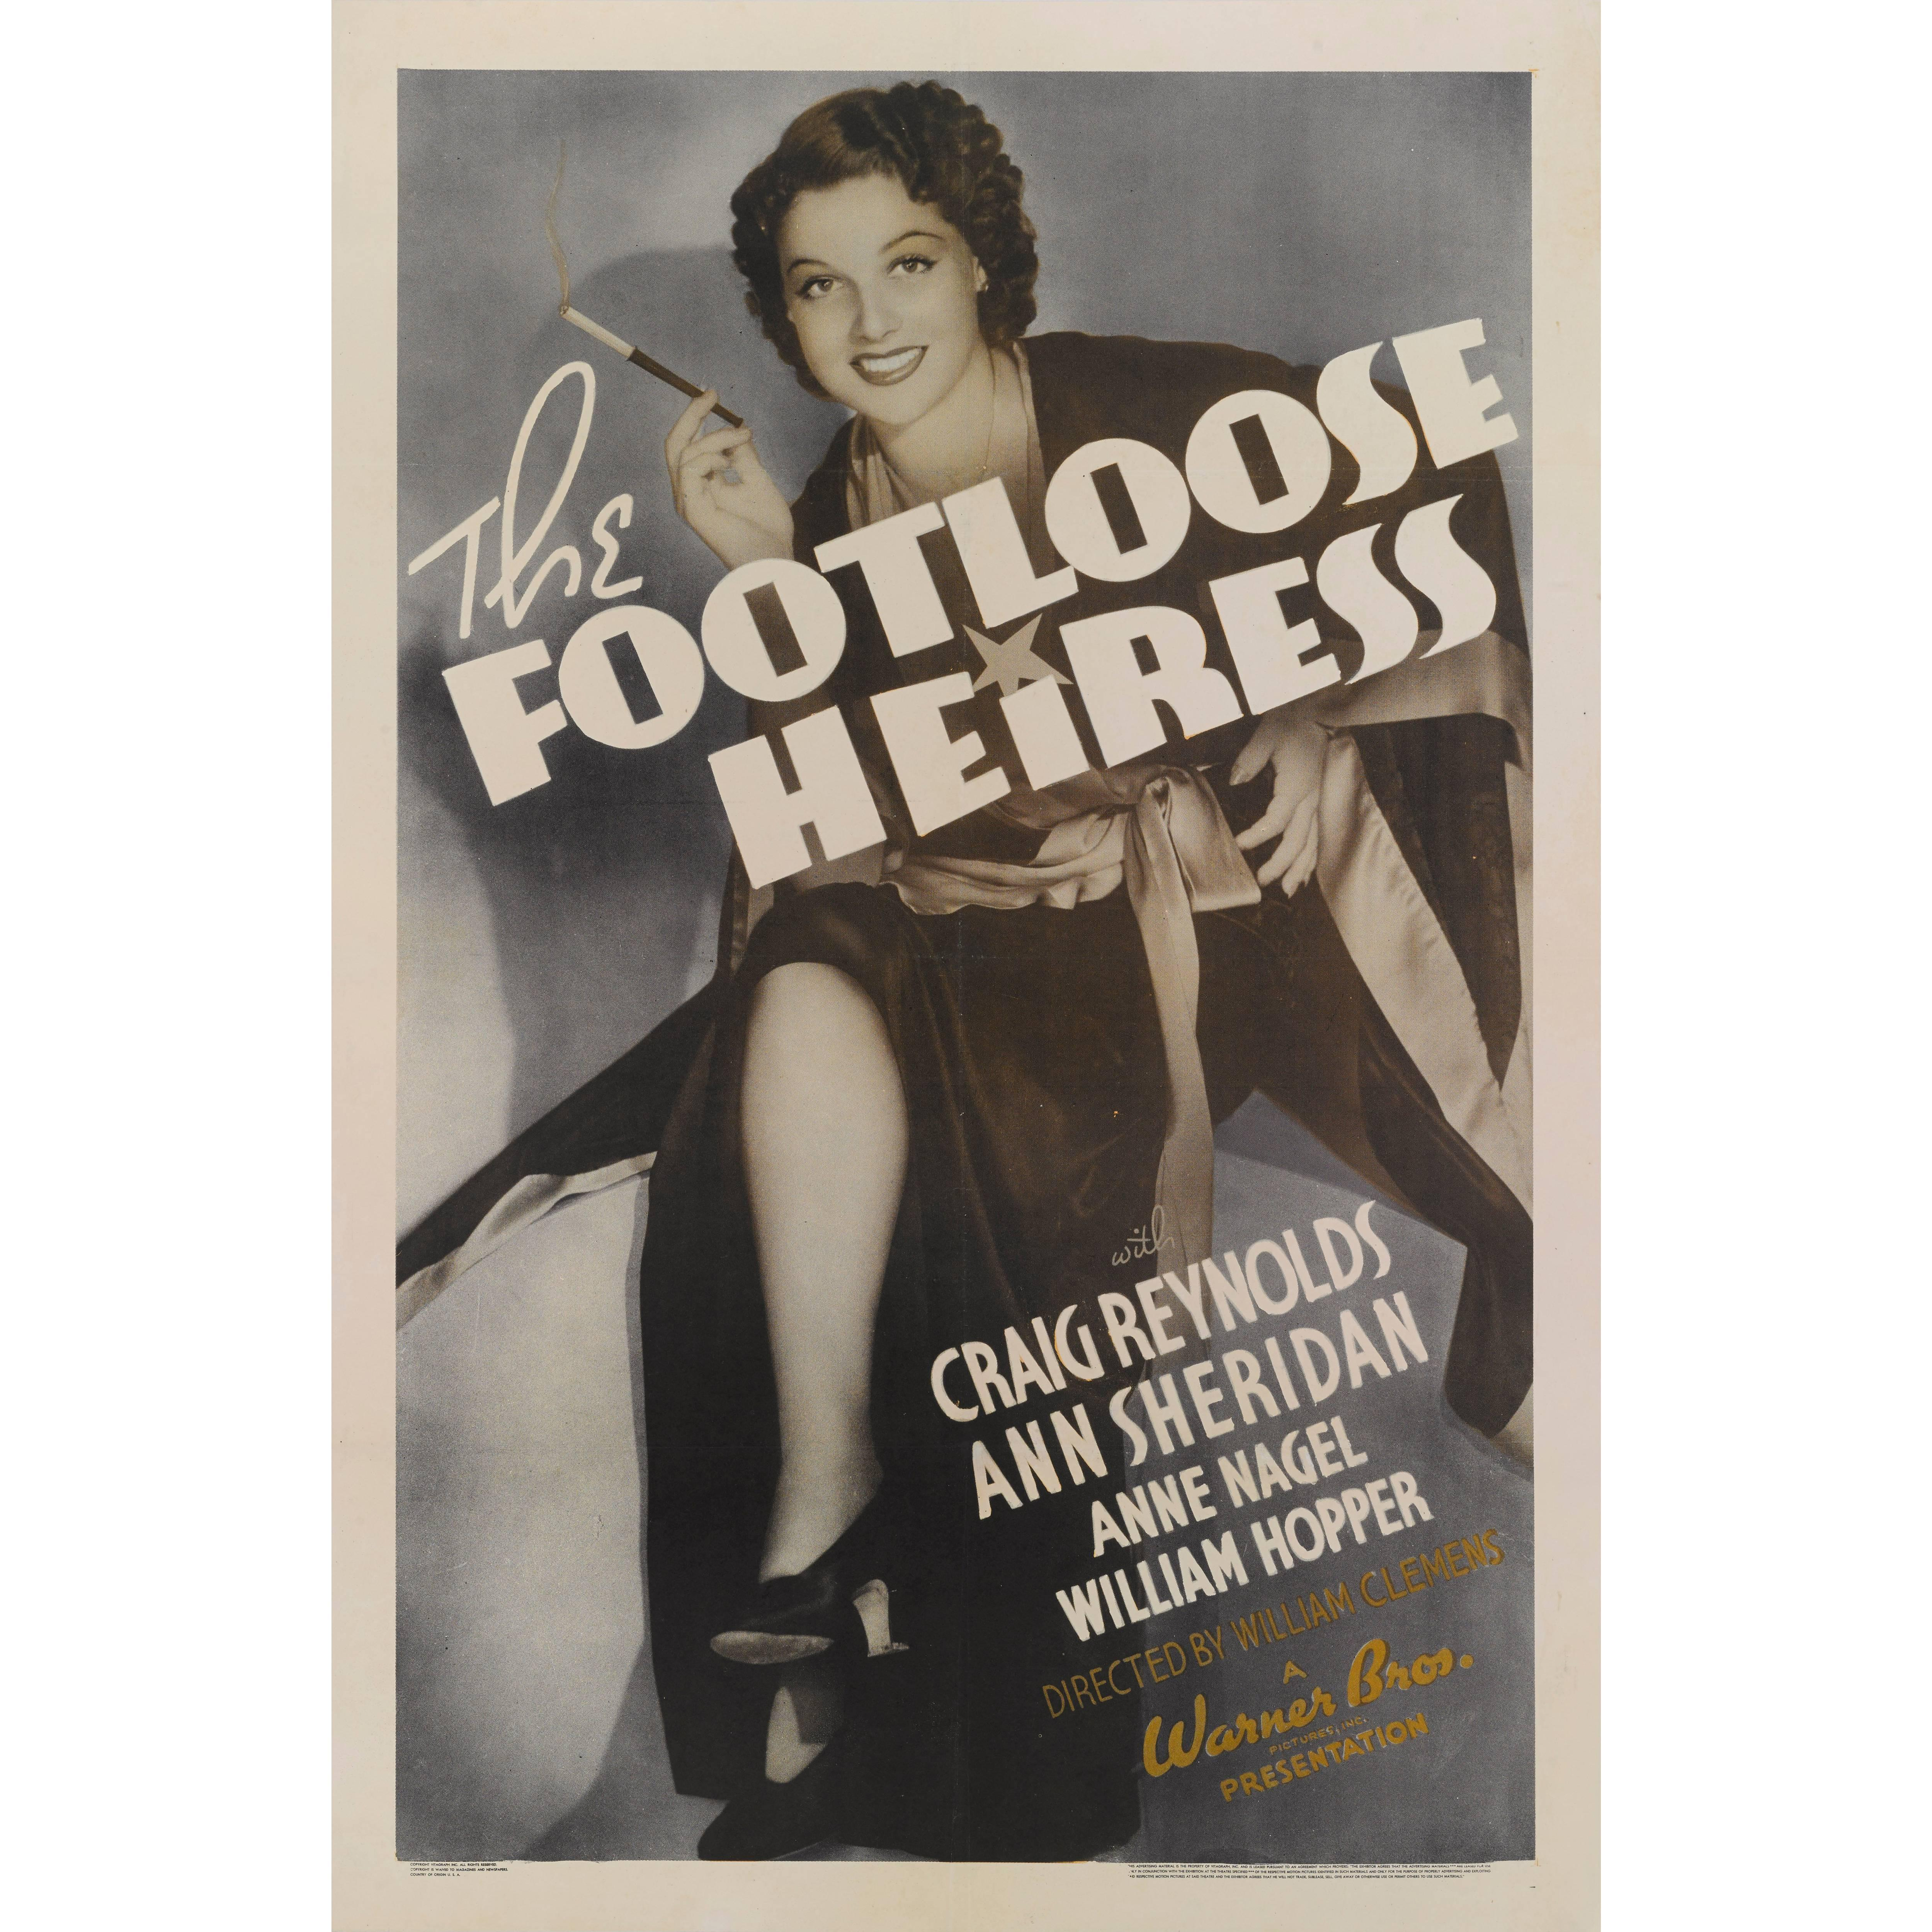 """The Footloose Heiress"" Original US Movie Poster"